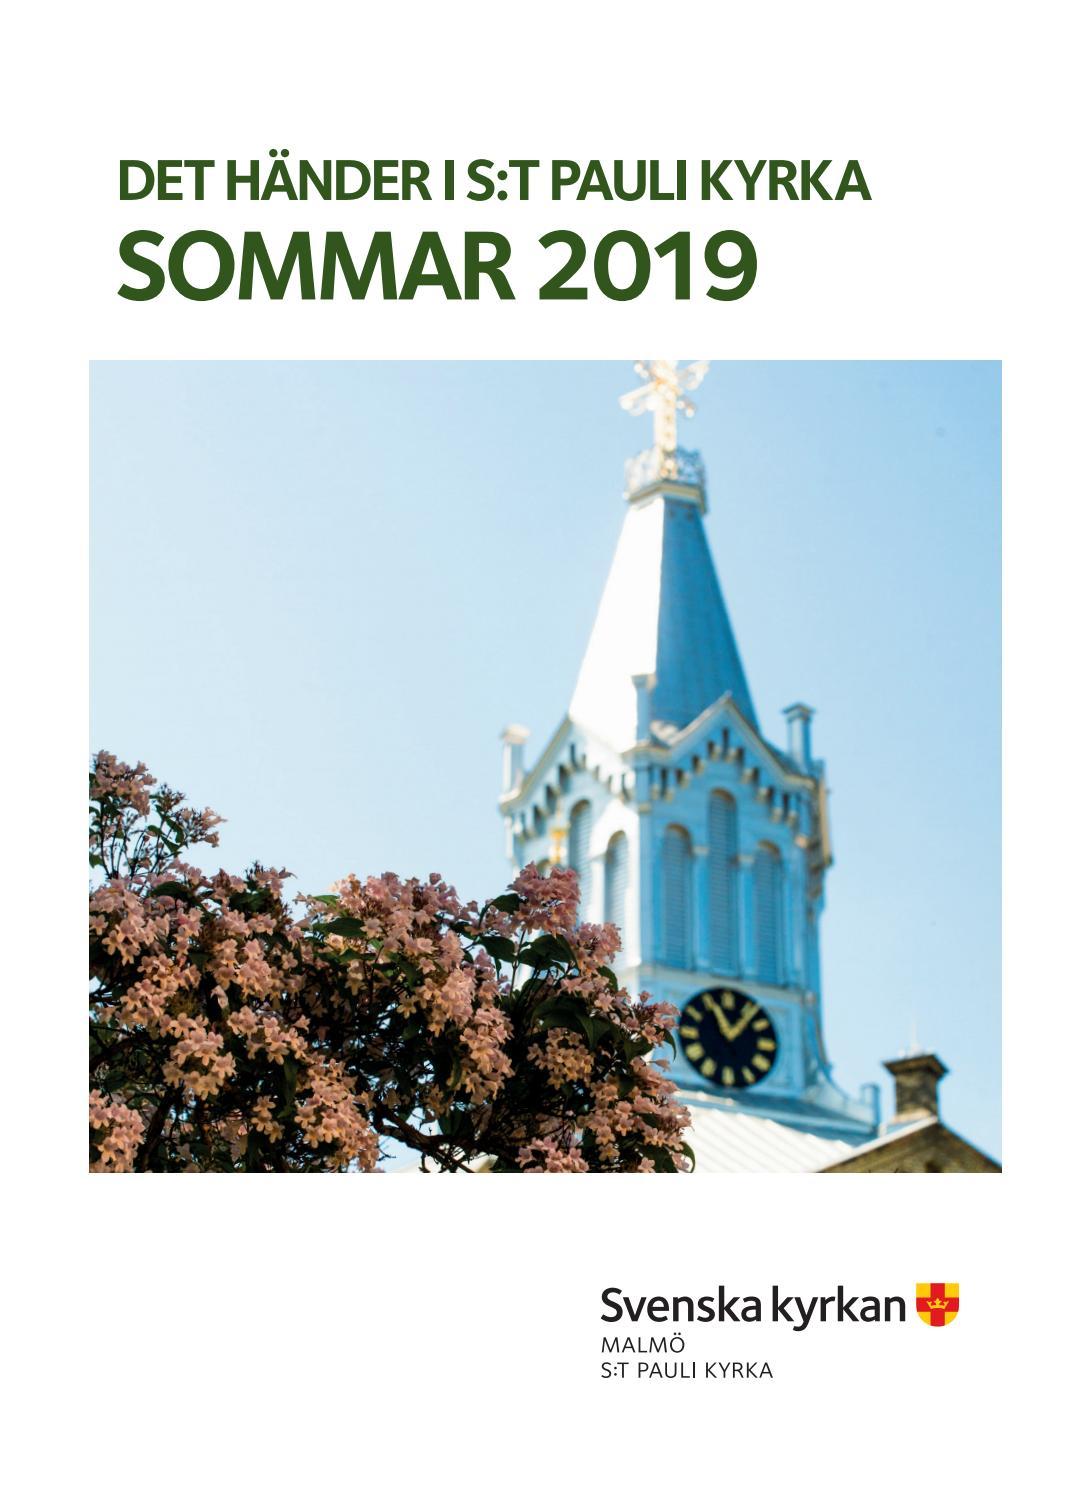 S:t Pauli kyrka - Svenskakyrkan Malm